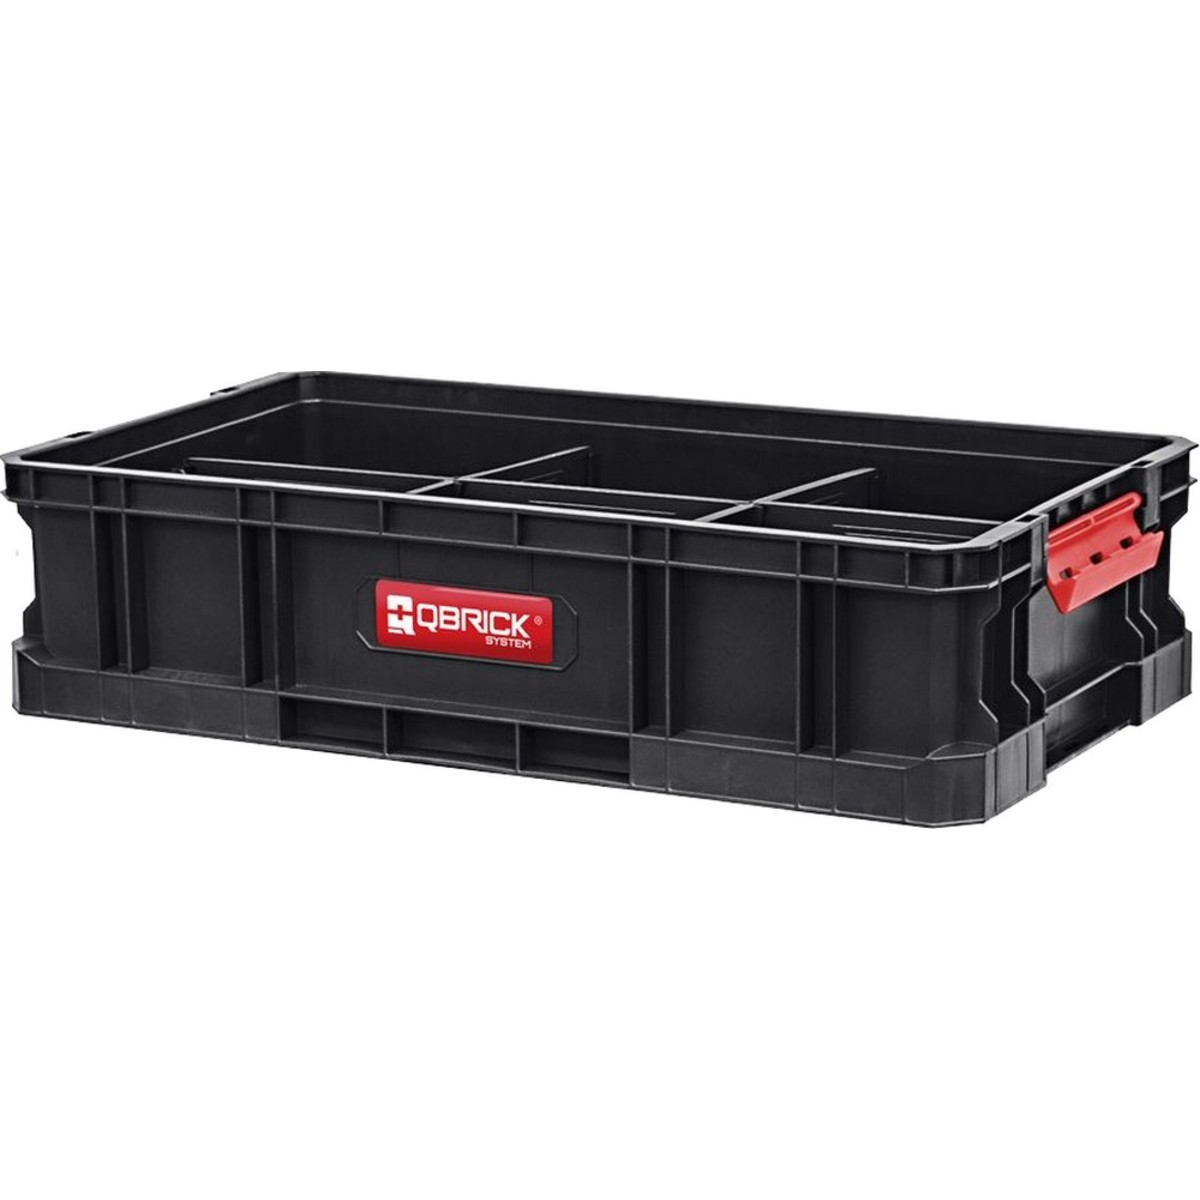 Ящик для инструментов QBRICK SYSTEM TWO BOX 100 FLEX 526x307x125мм